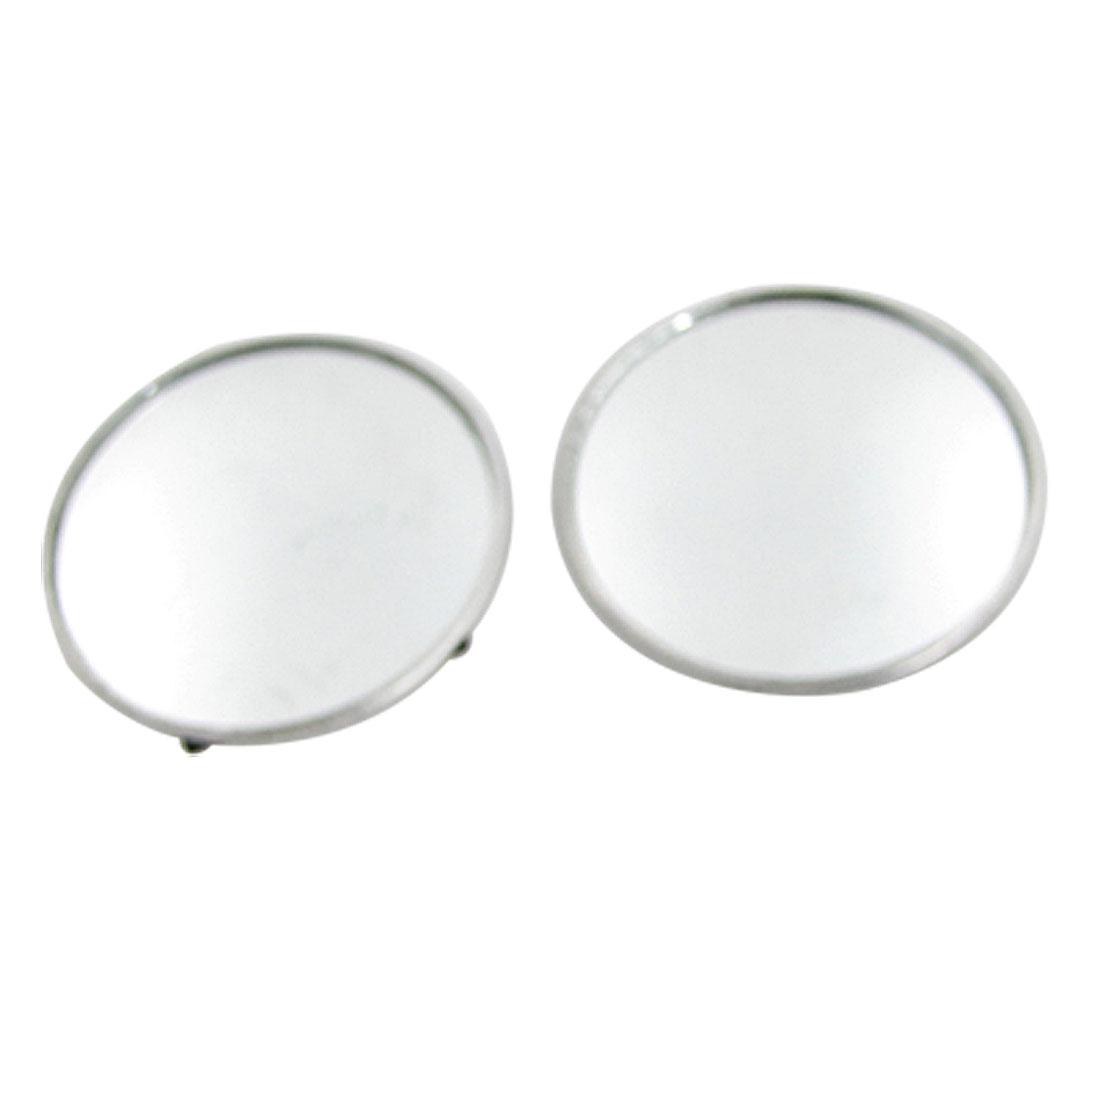 "2 PCS 2"" Diameter Silver Tone Car Convex Blind Spot Mirror"